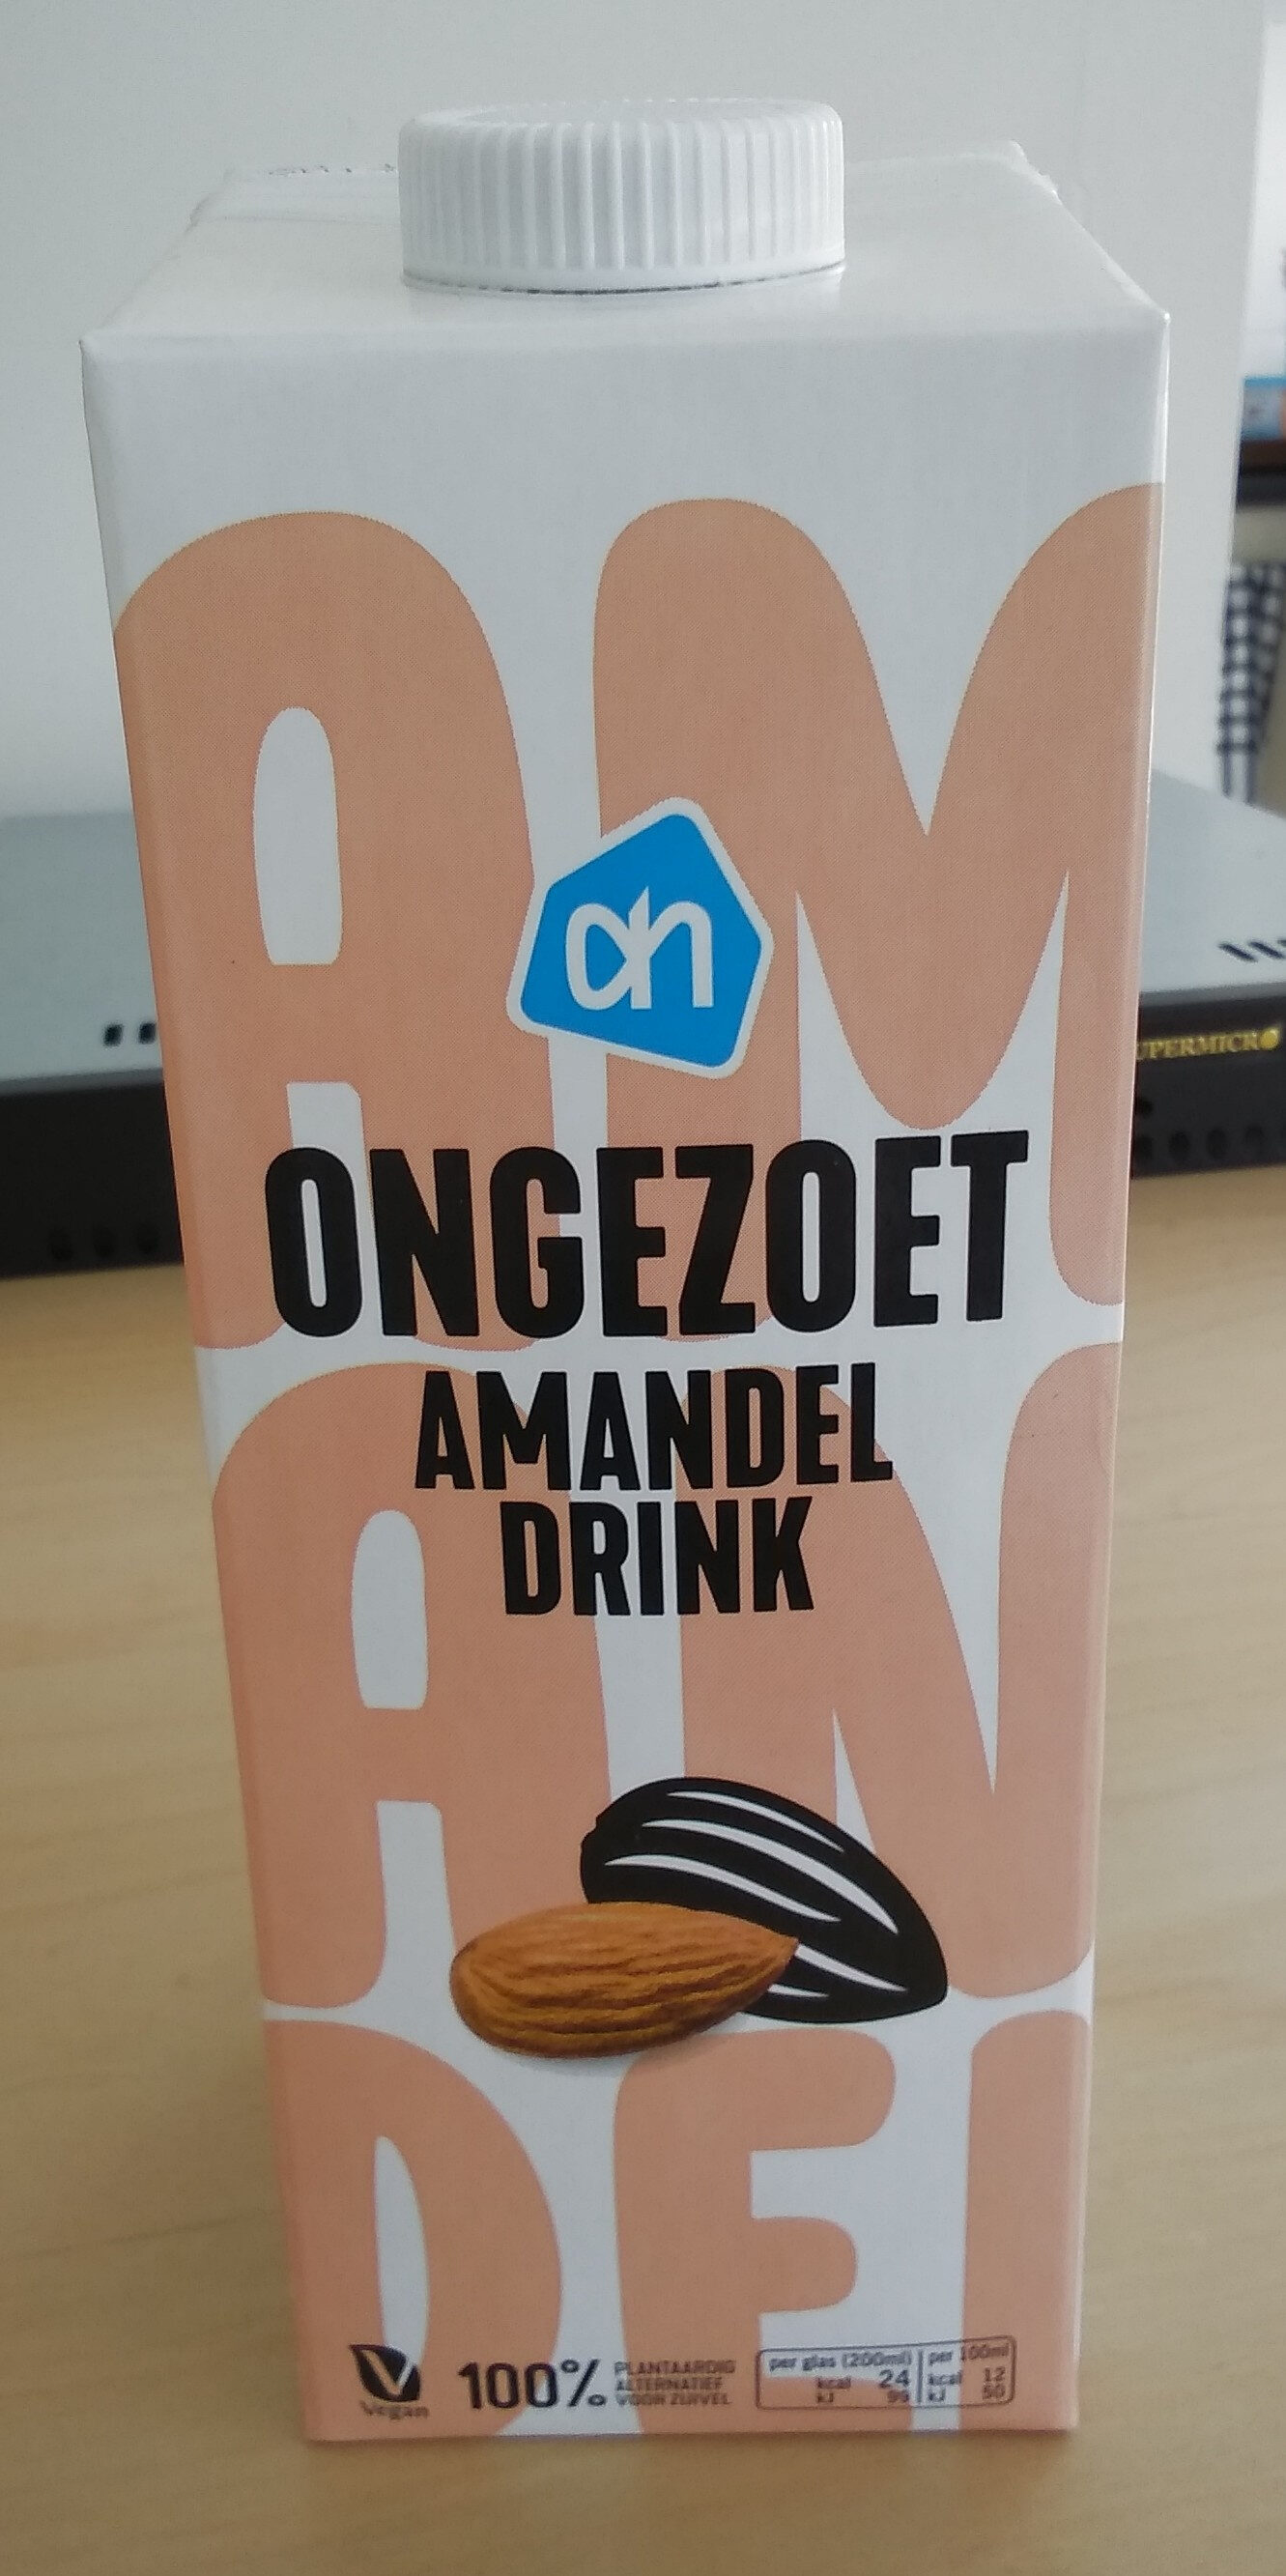 Amandel drink - ongezoet - Produit - fr